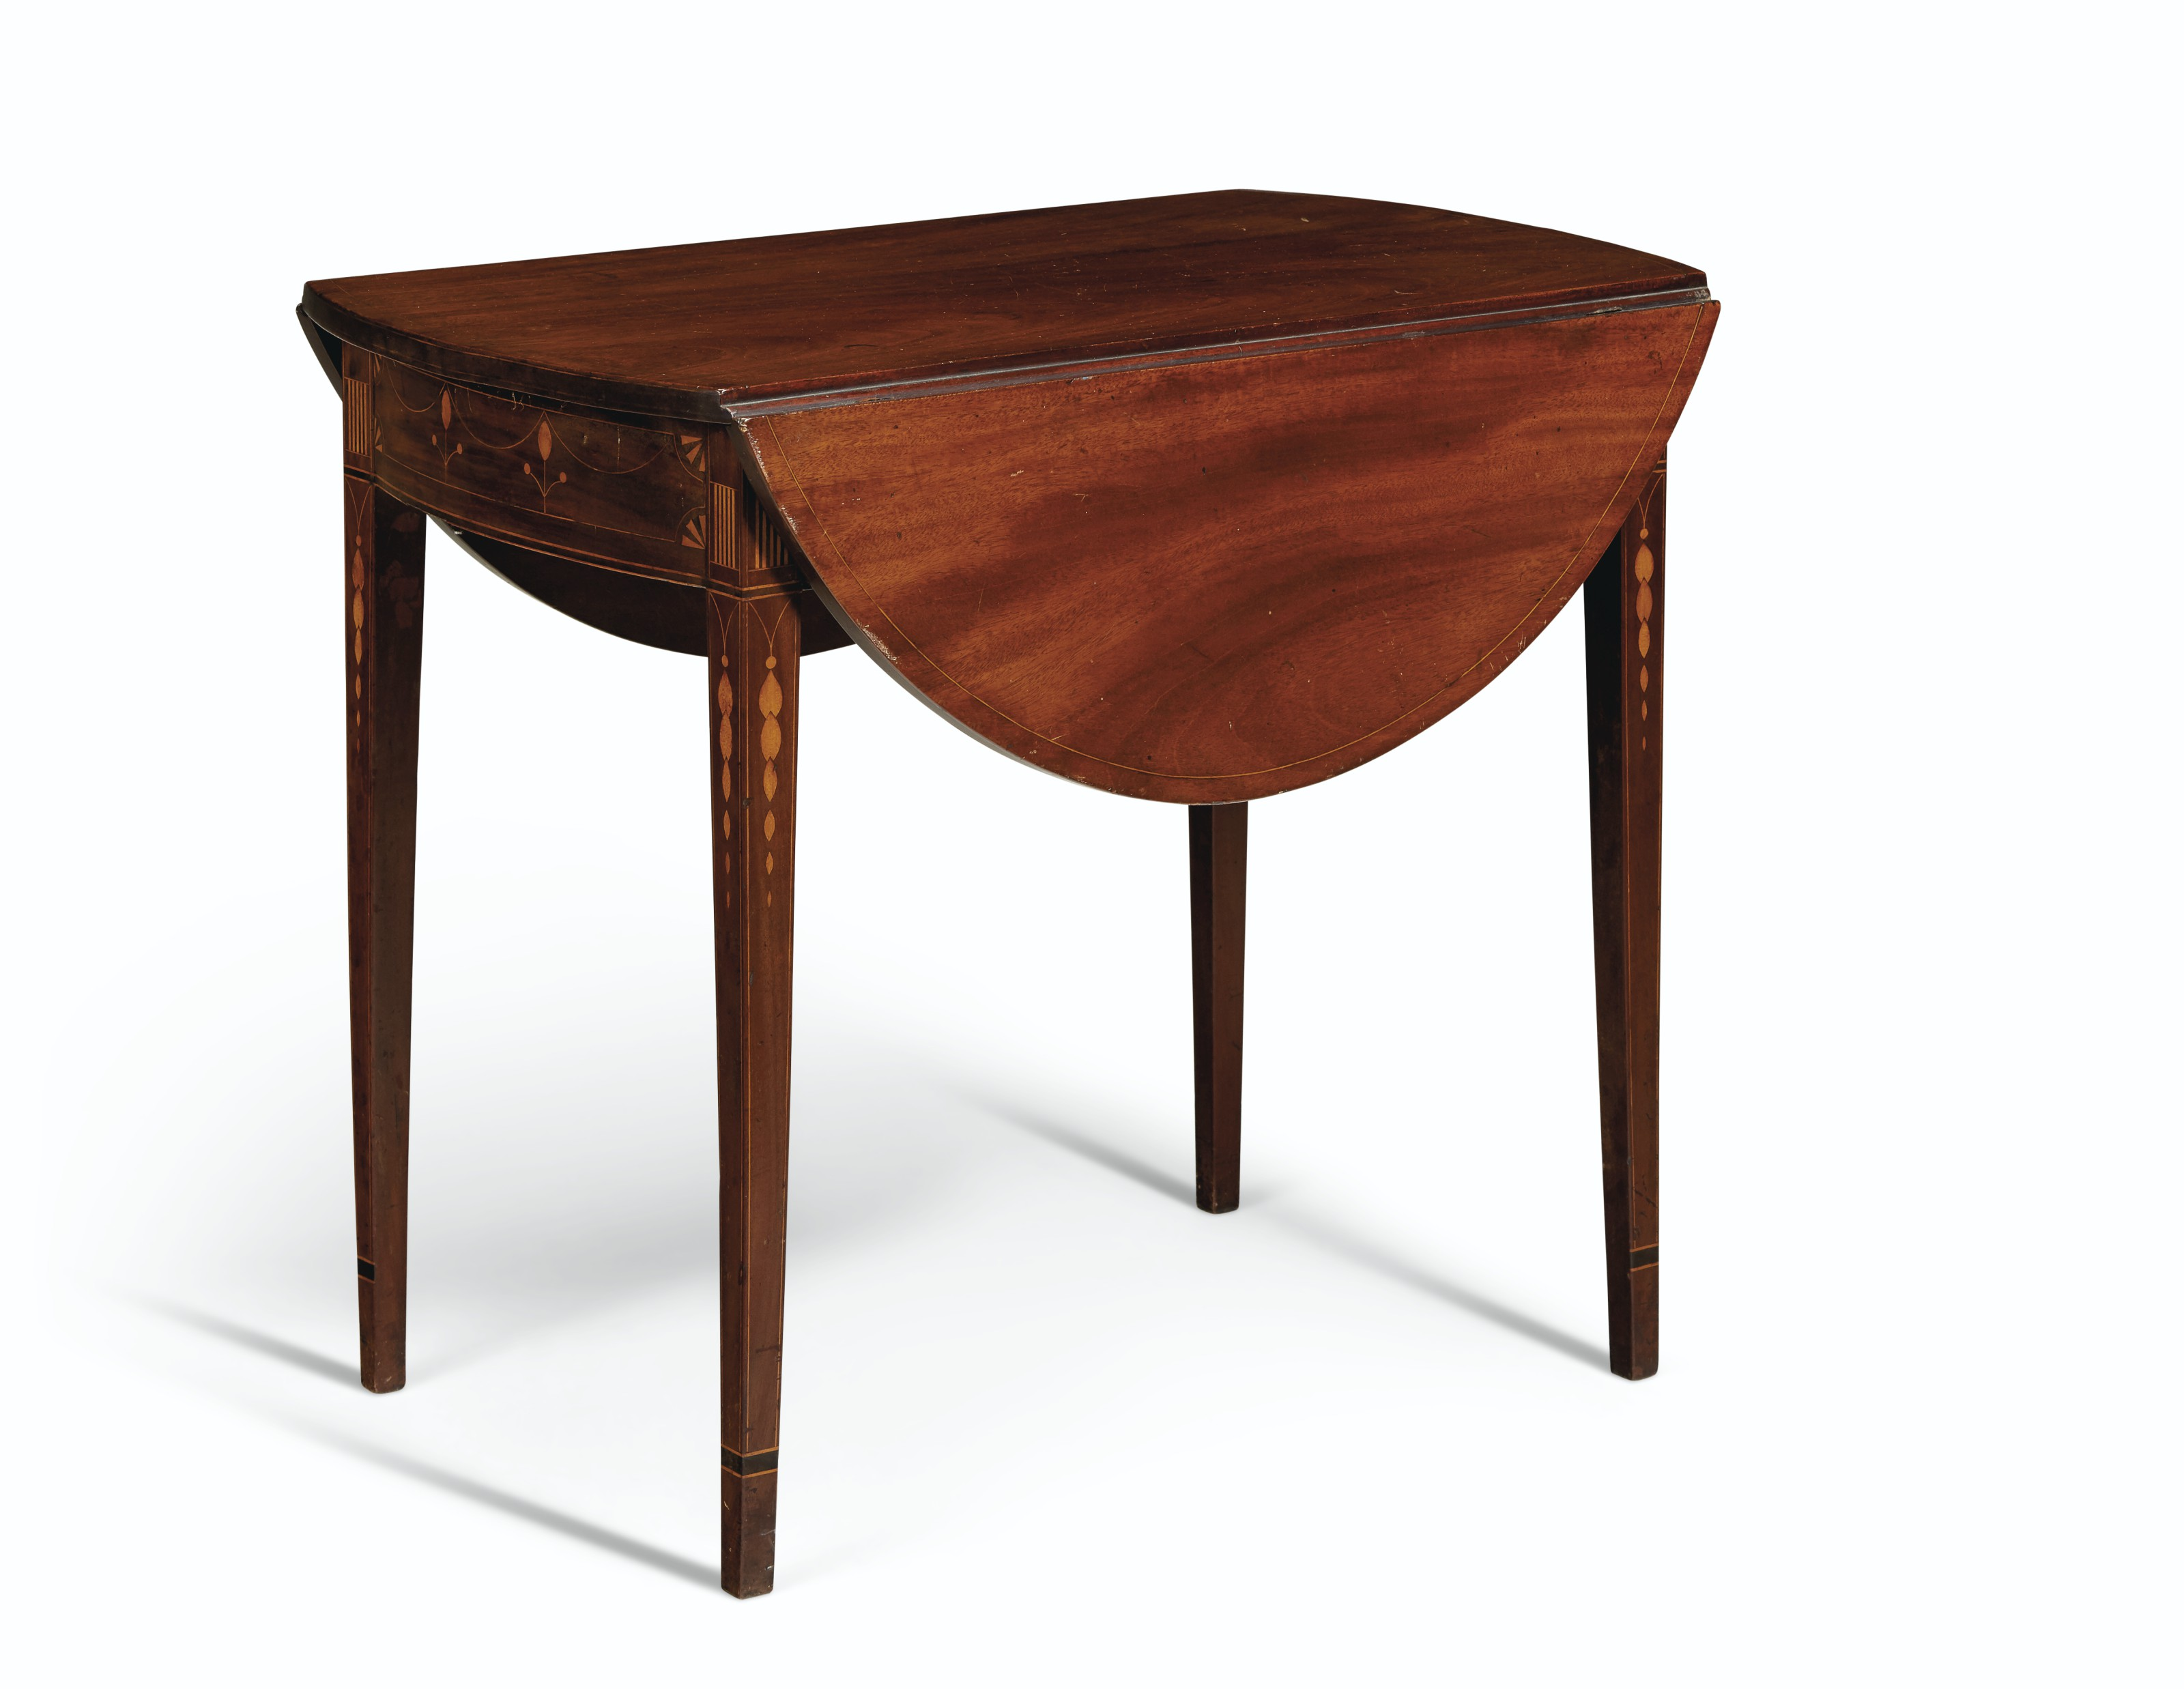 A FEDERAL INLAID MAHOGANY PEMBROKE TABLE